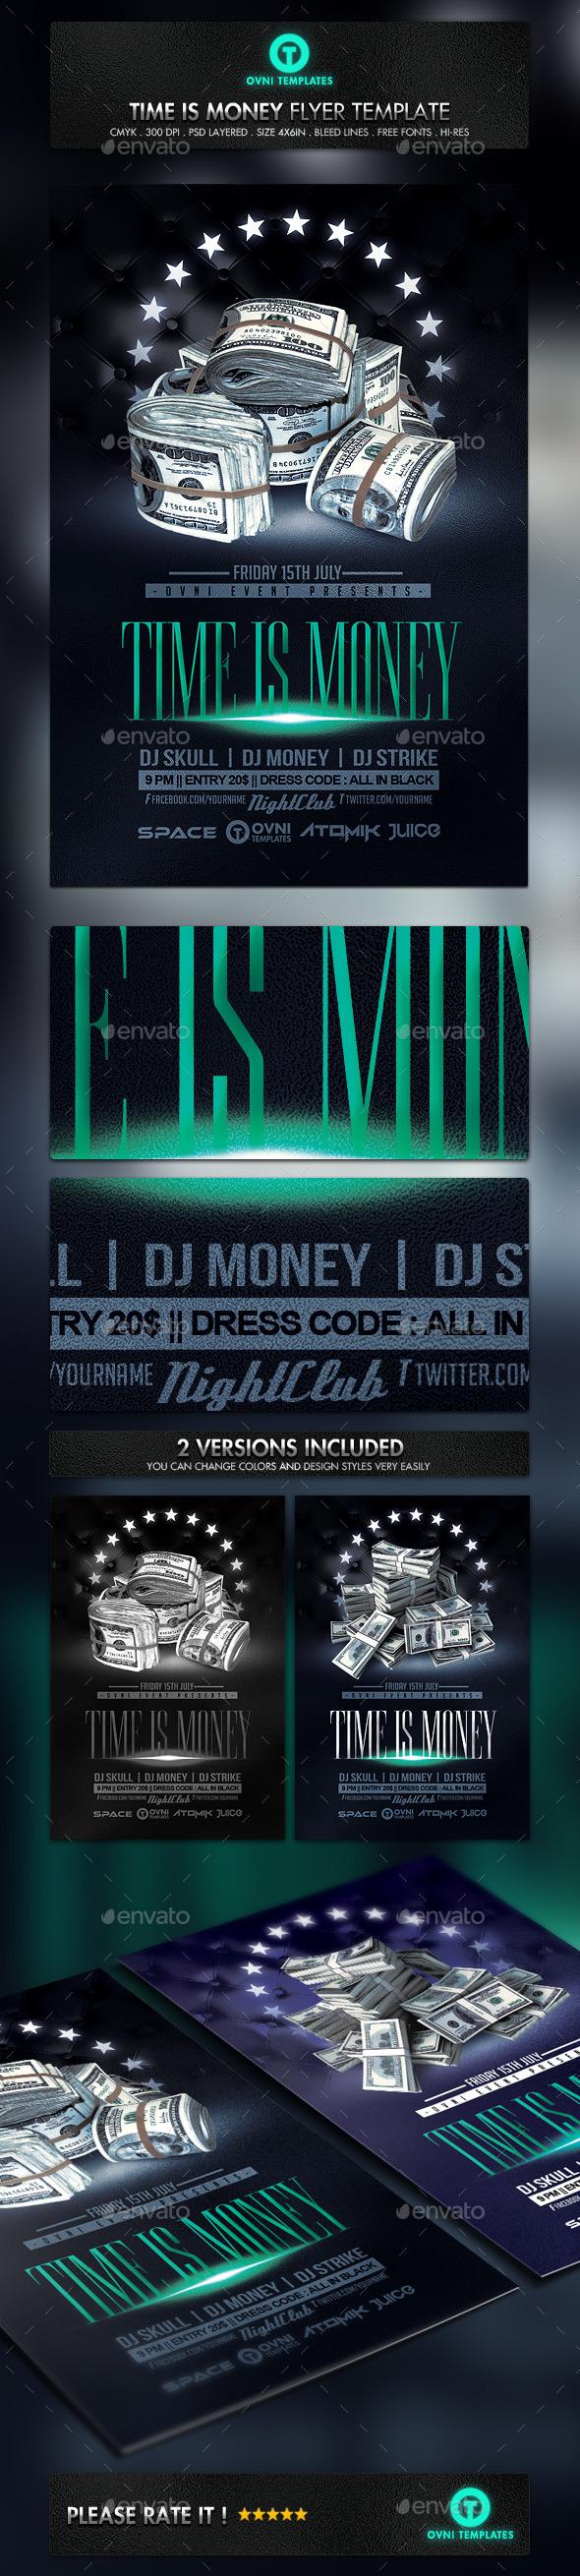 Cash Money Flyer Template Photoshop PSD Dollar Bills Celebration - Money flyer template